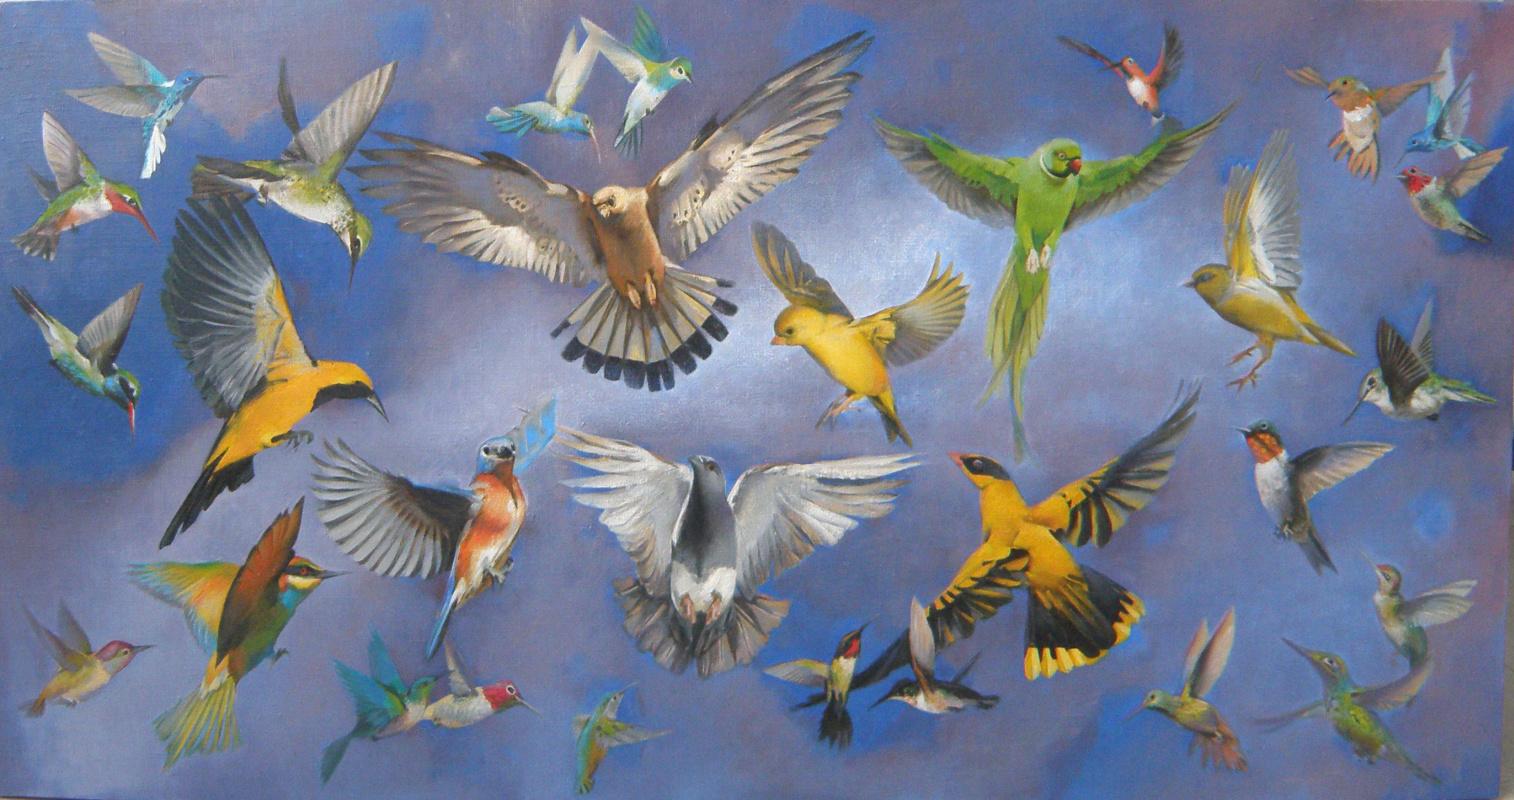 Polina Anatolyevna Kolddomasova. Birds2